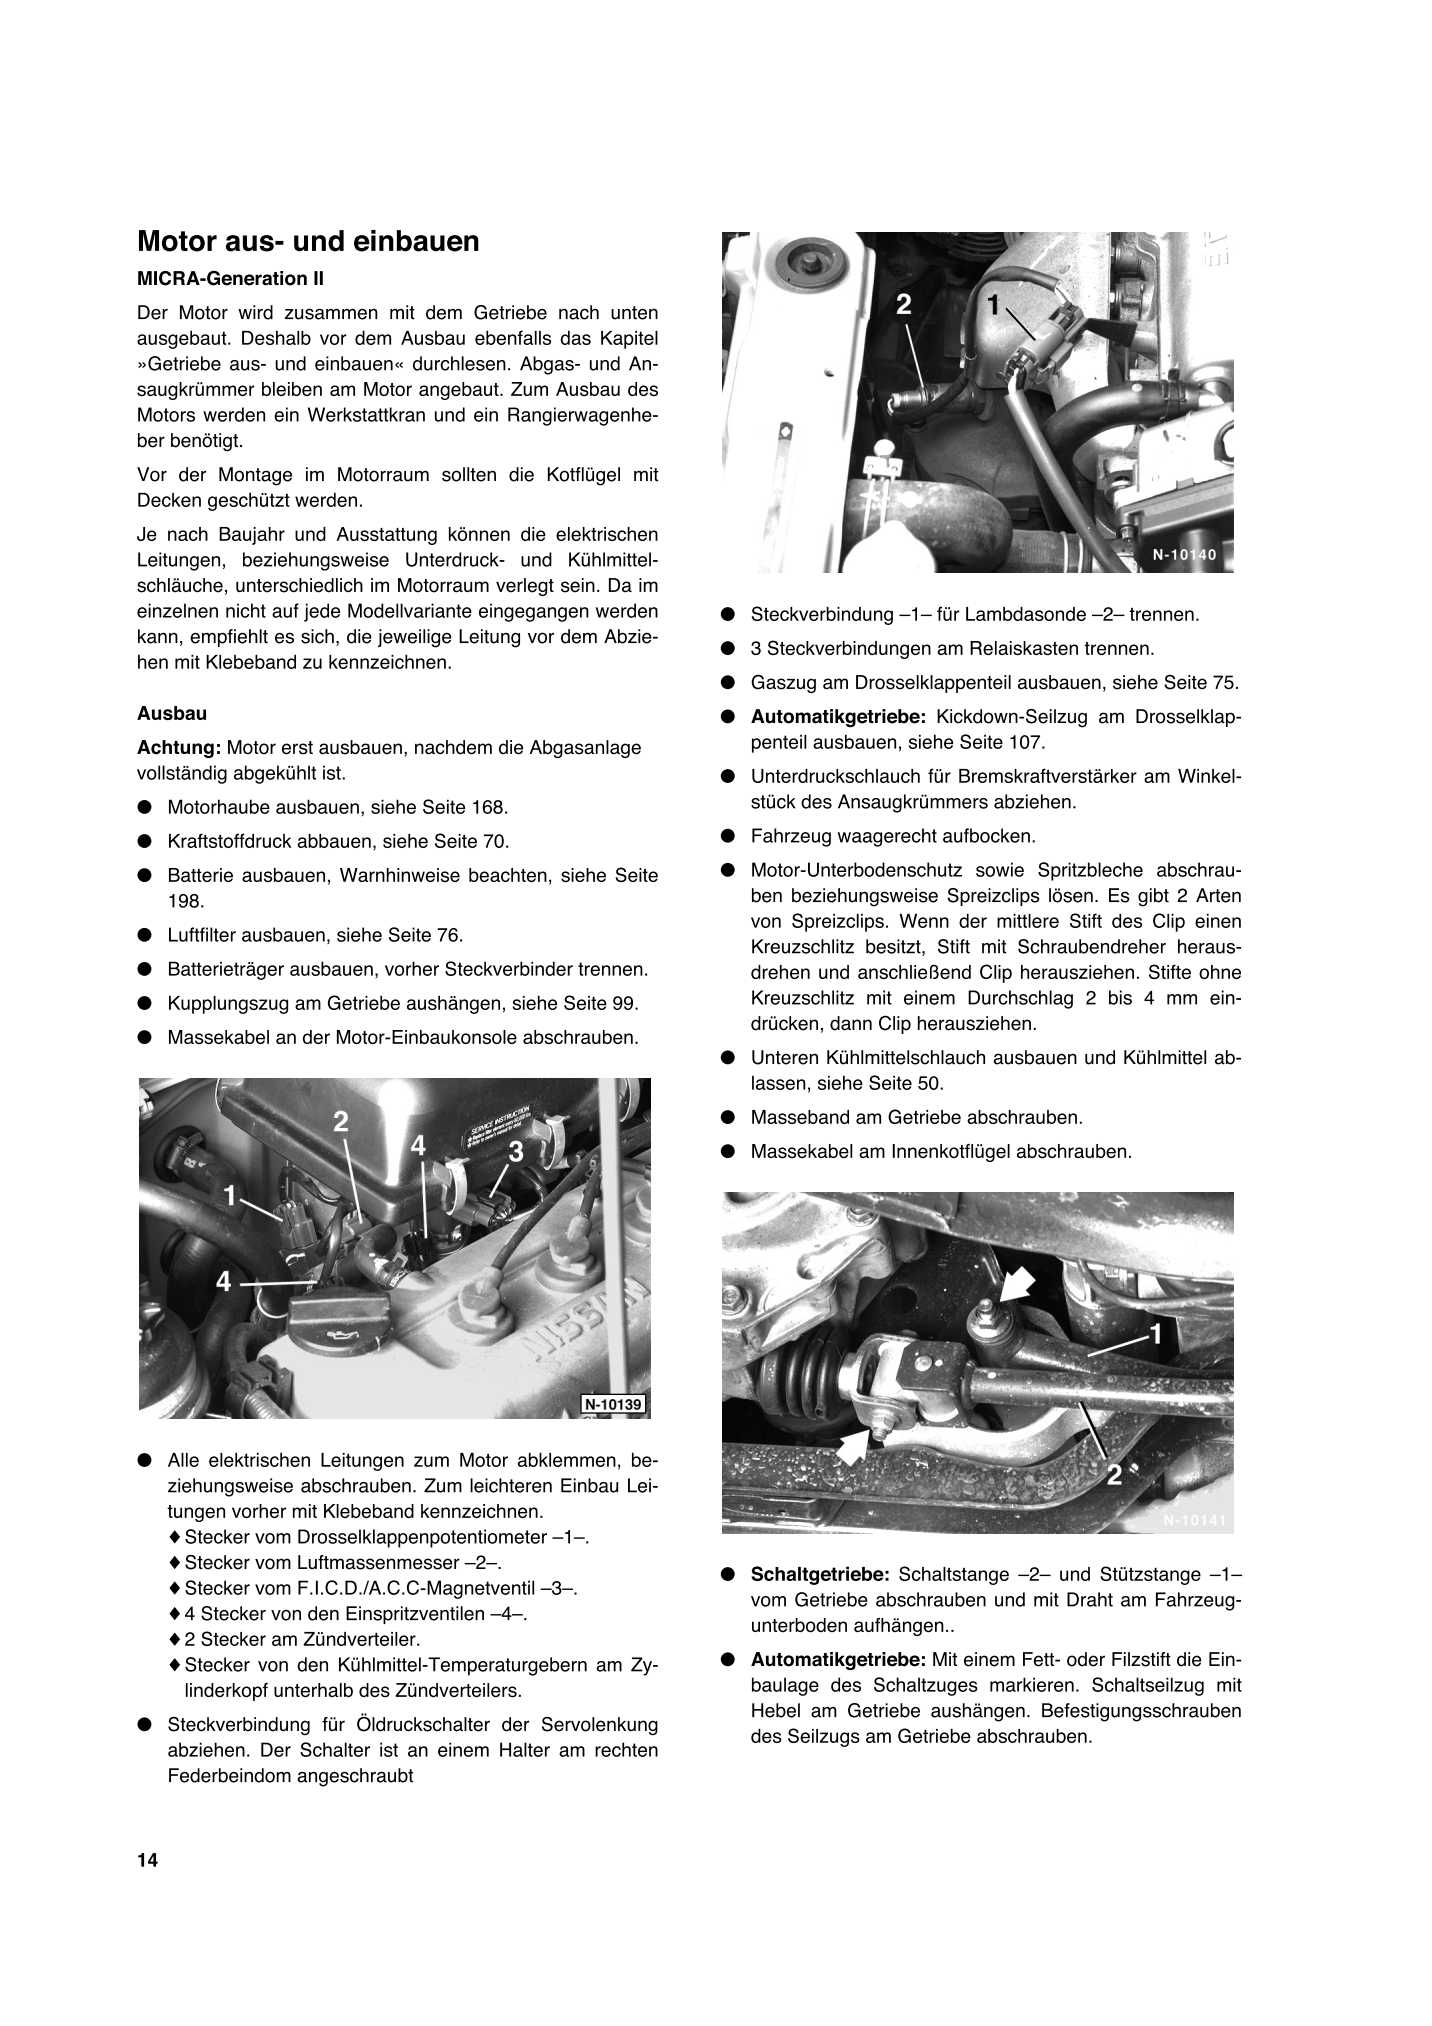 Reparaturanleitung Nissan Micra So Wird S Gemacht